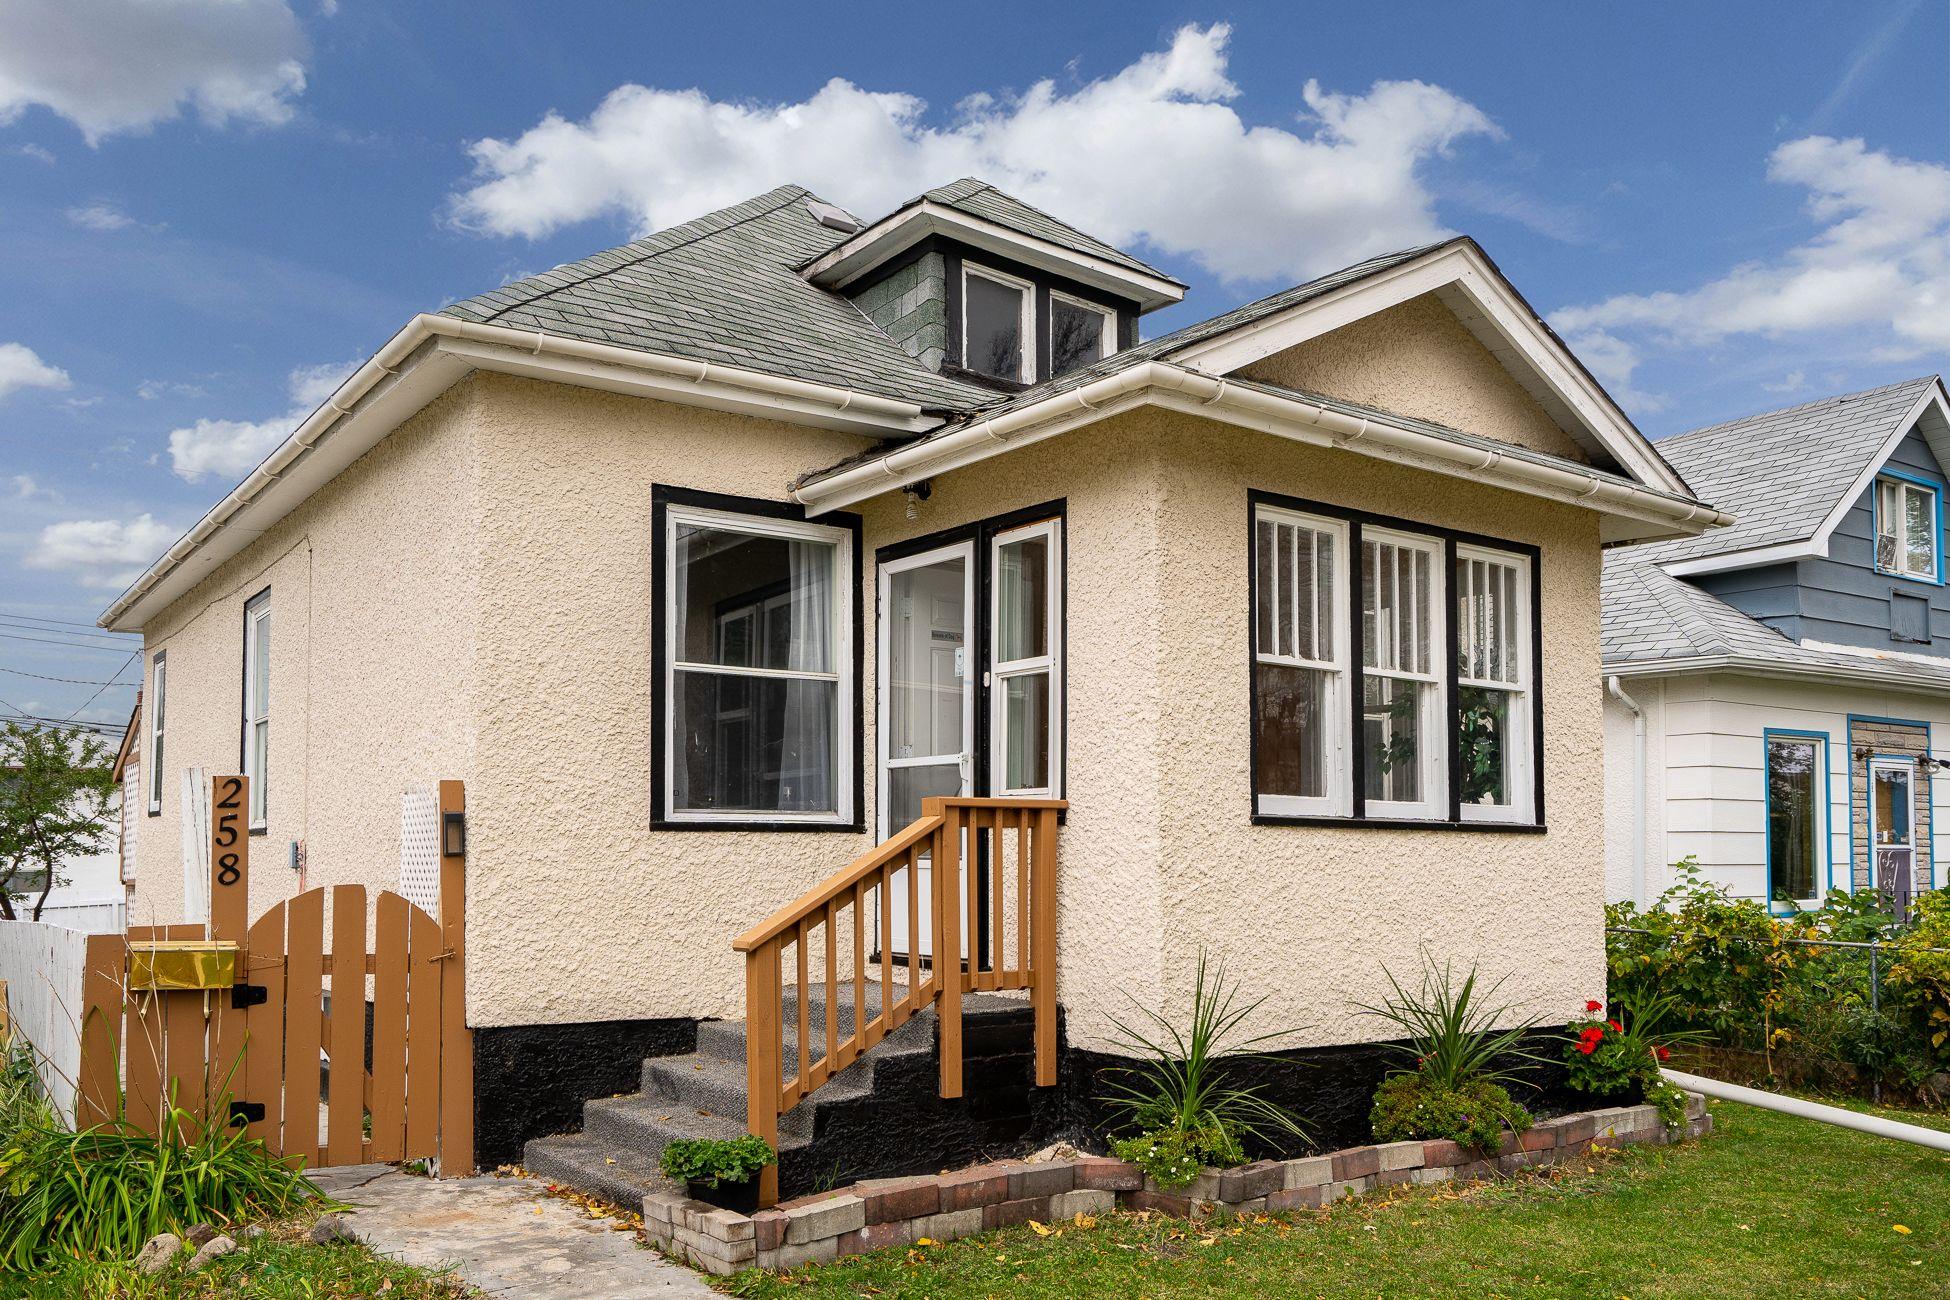 Main Photo: 258 Chalmers Avenue in Winnipeg: Elmwood House for sale (3A)  : MLS®# 202024878